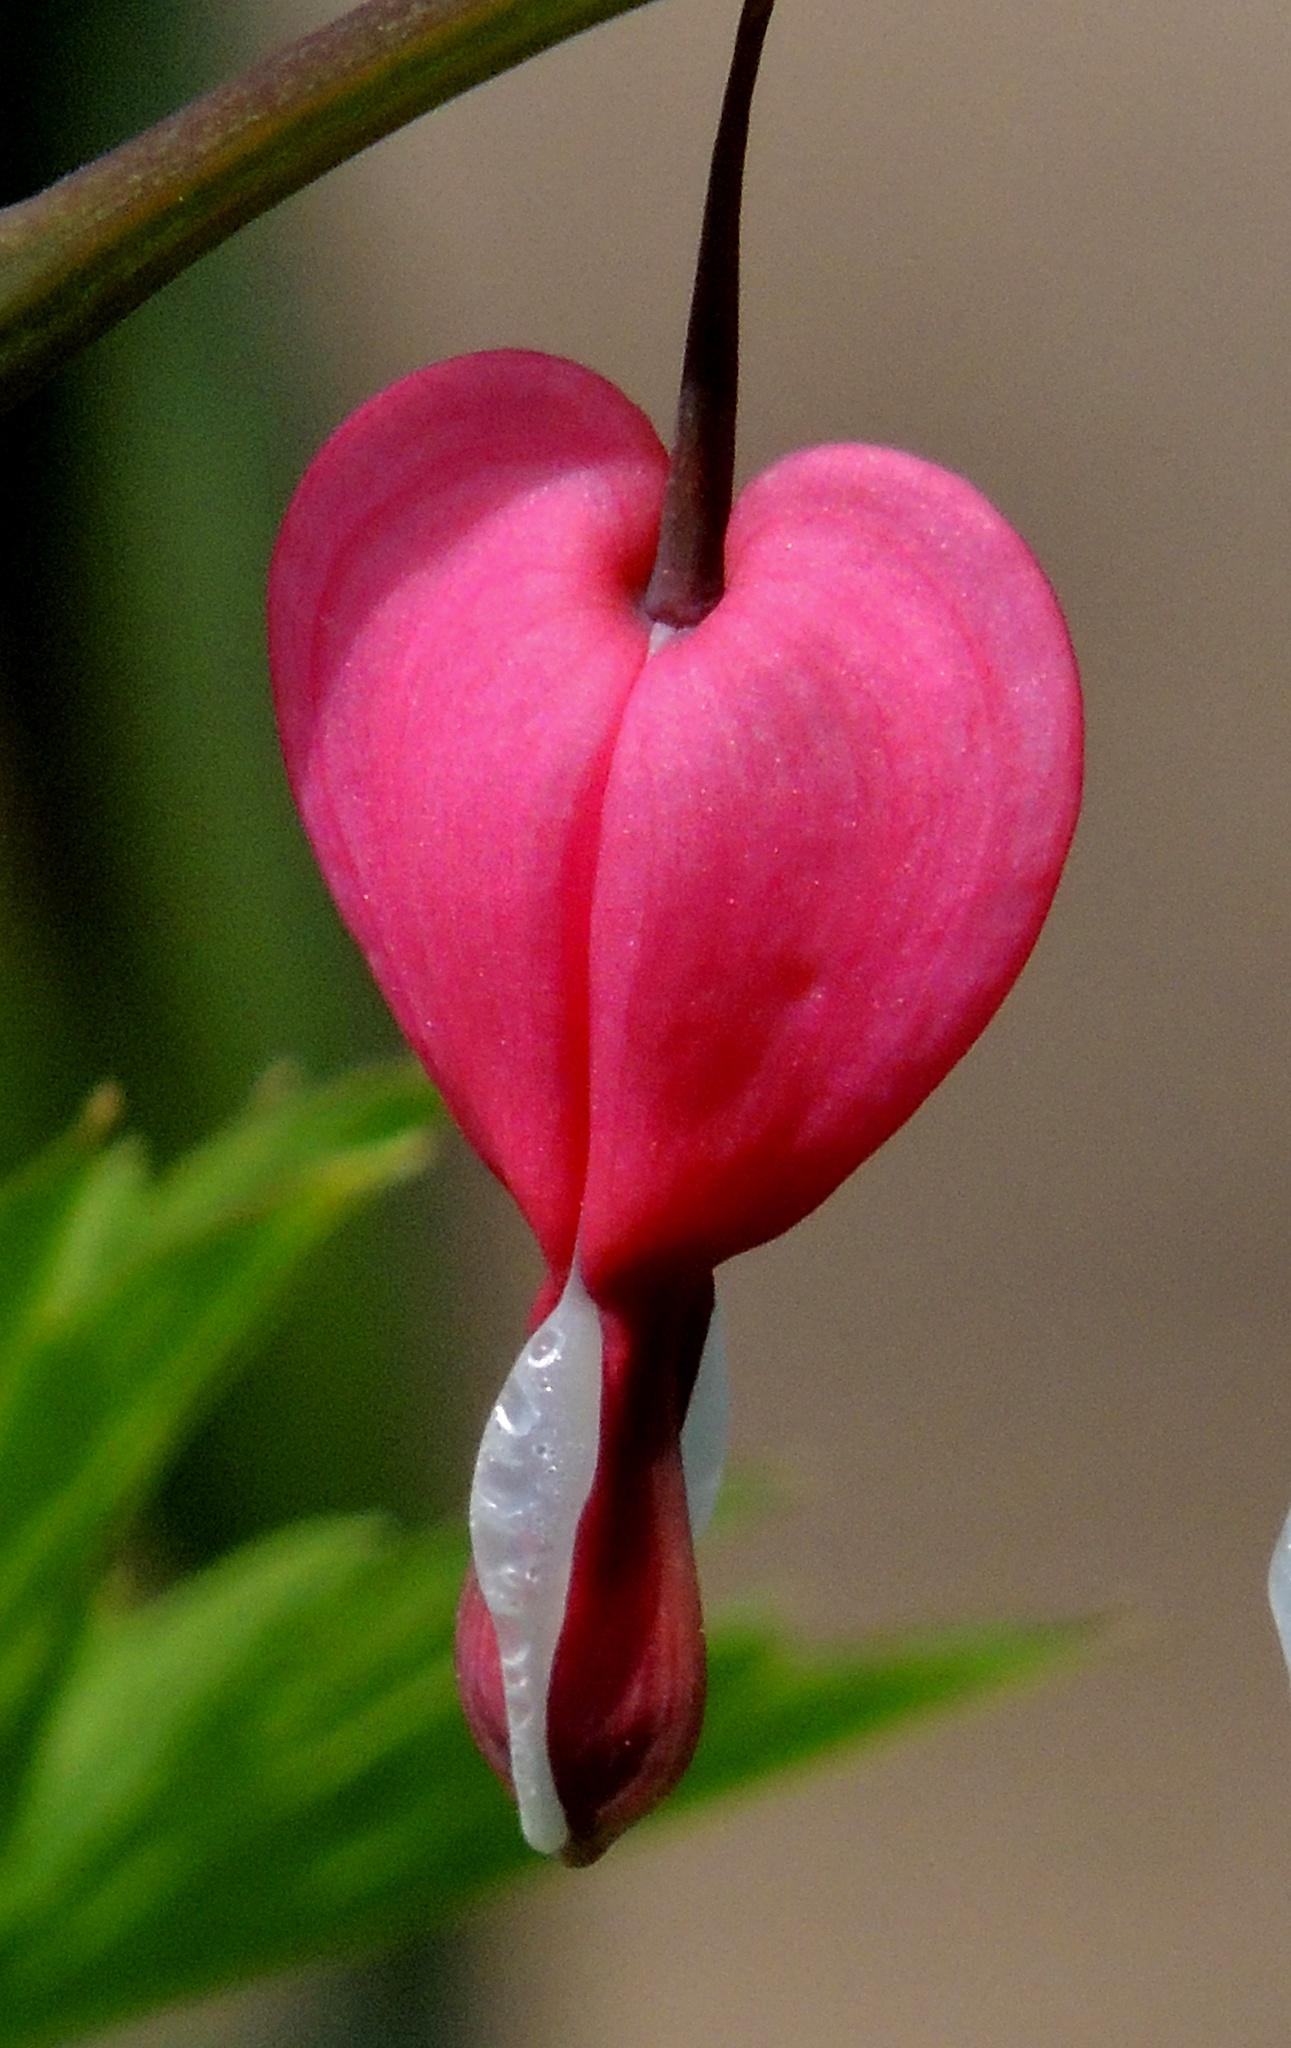 Bleeding Heart by carol.capozzi.18